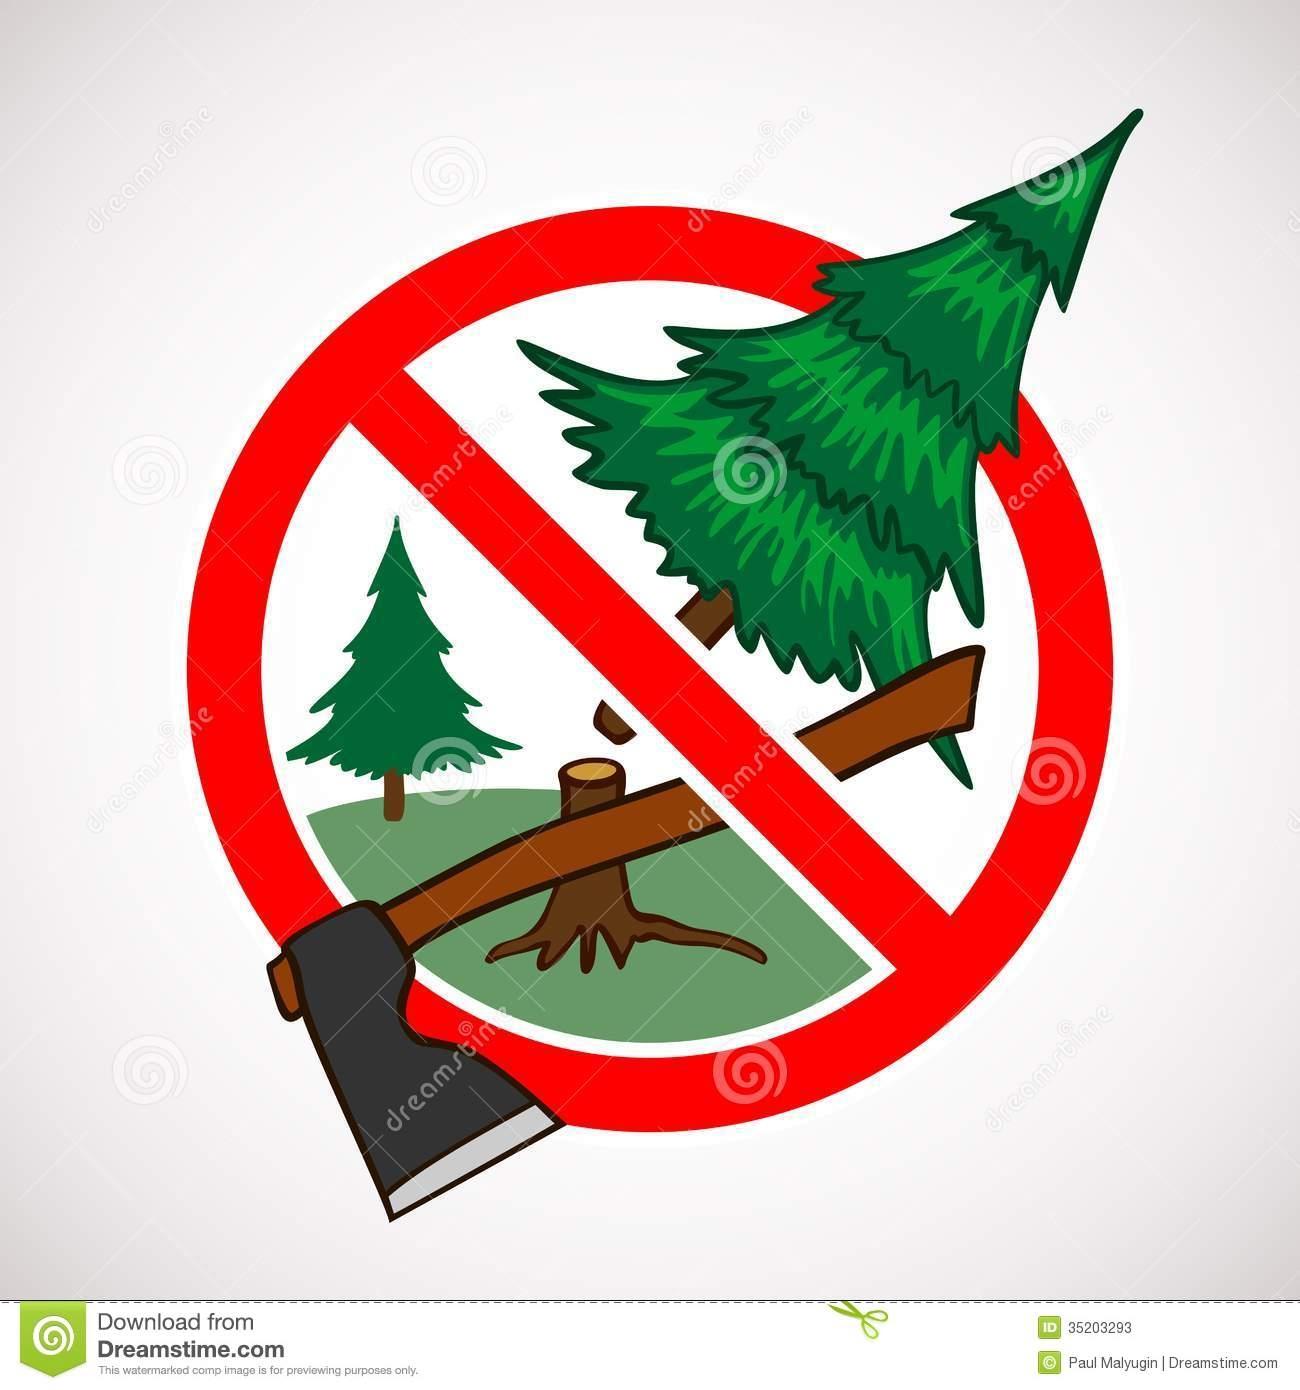 Do not cut trees clipart.